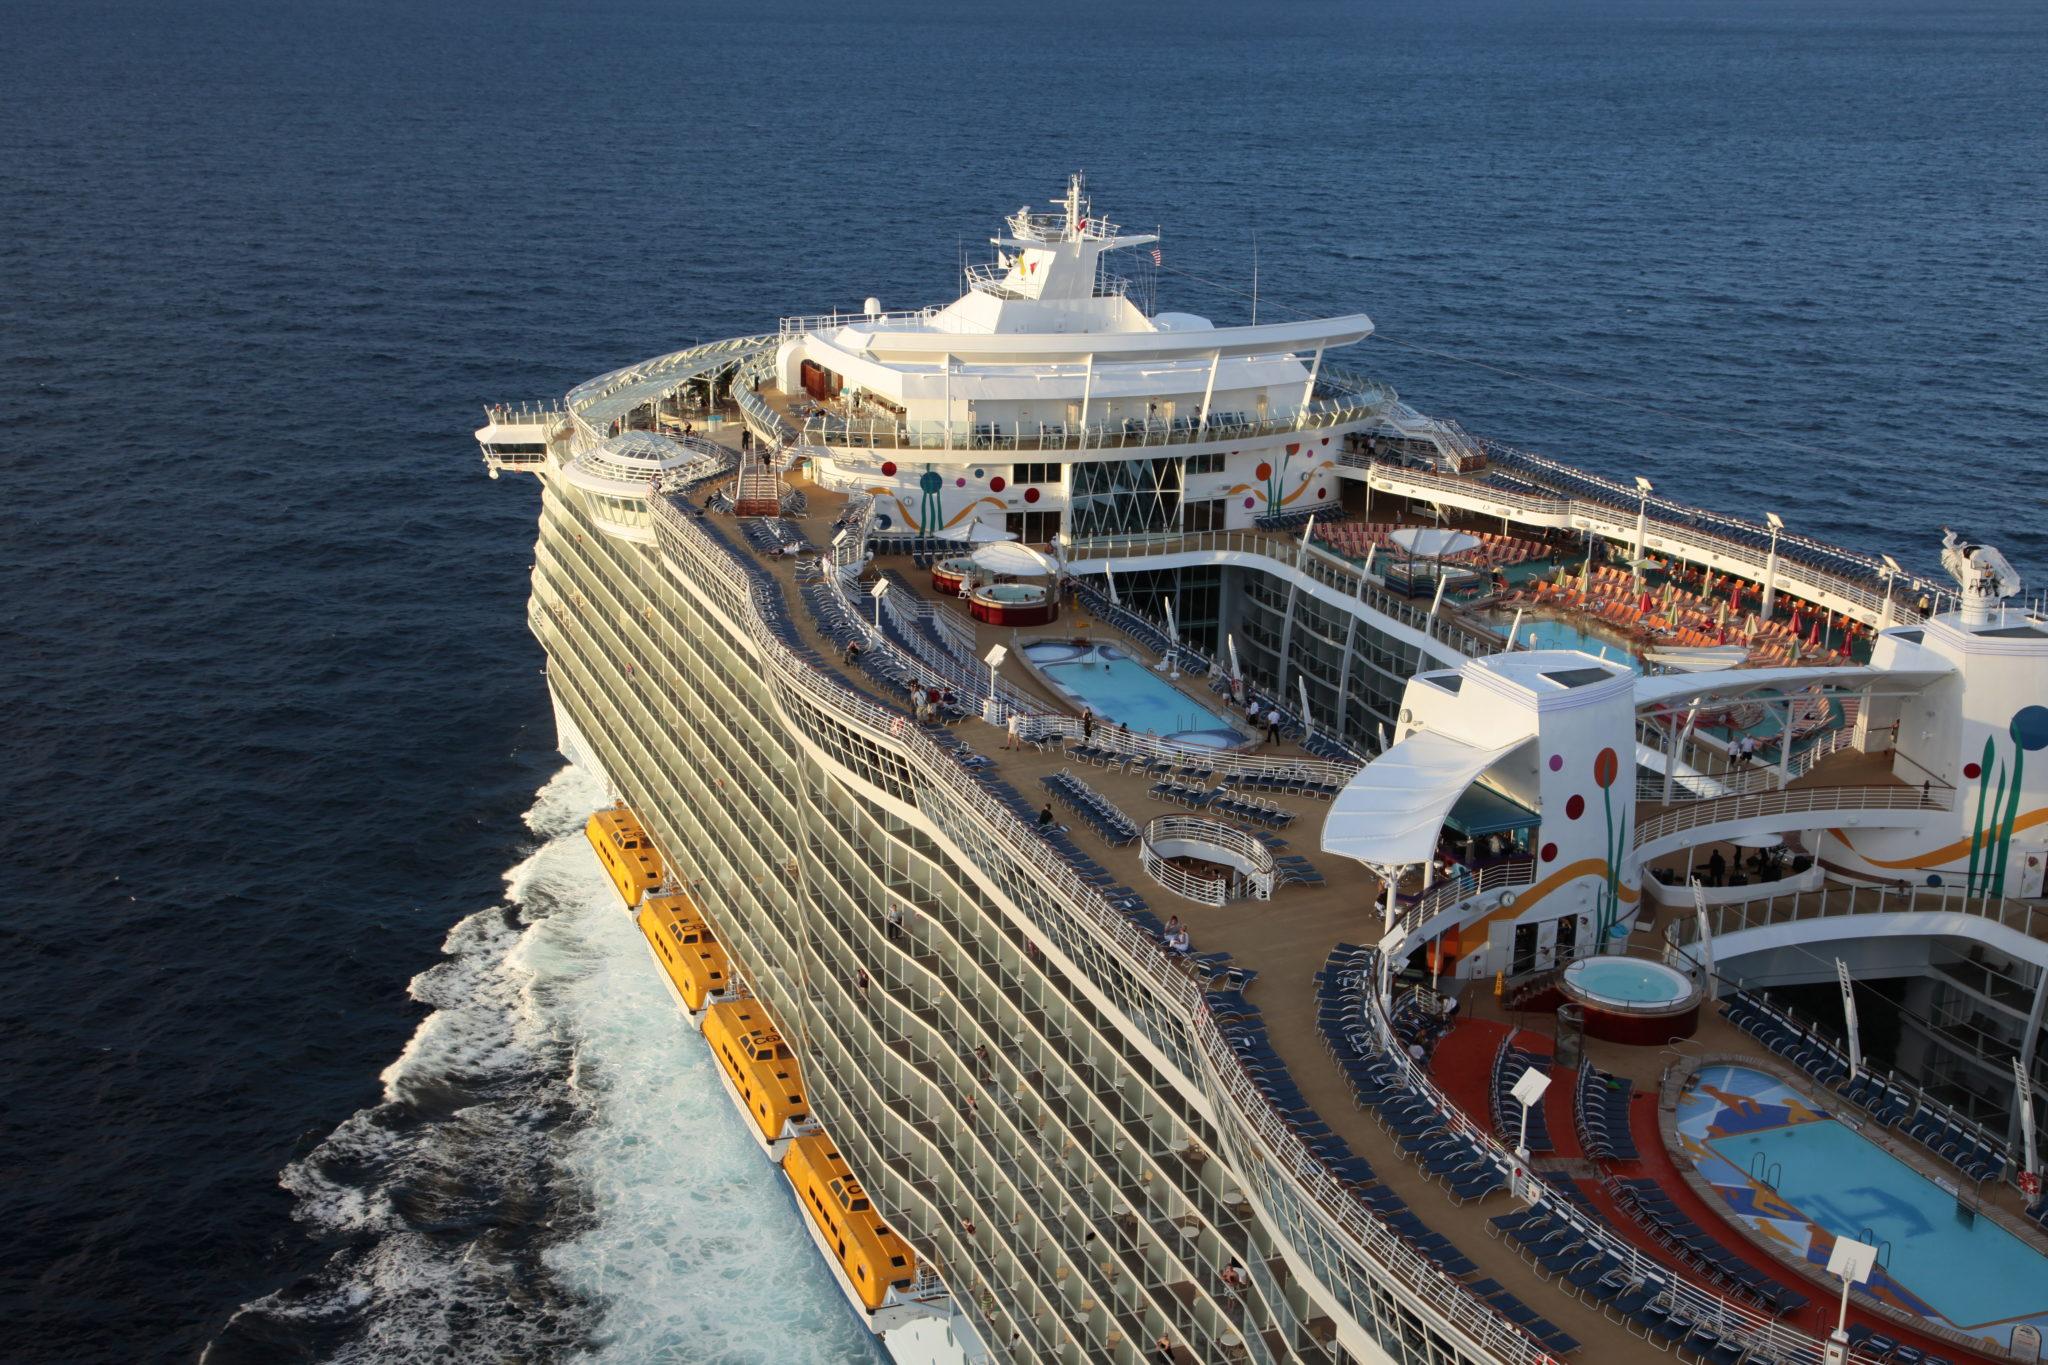 Royal Caribbean Sends Megaship to Texas in 2022